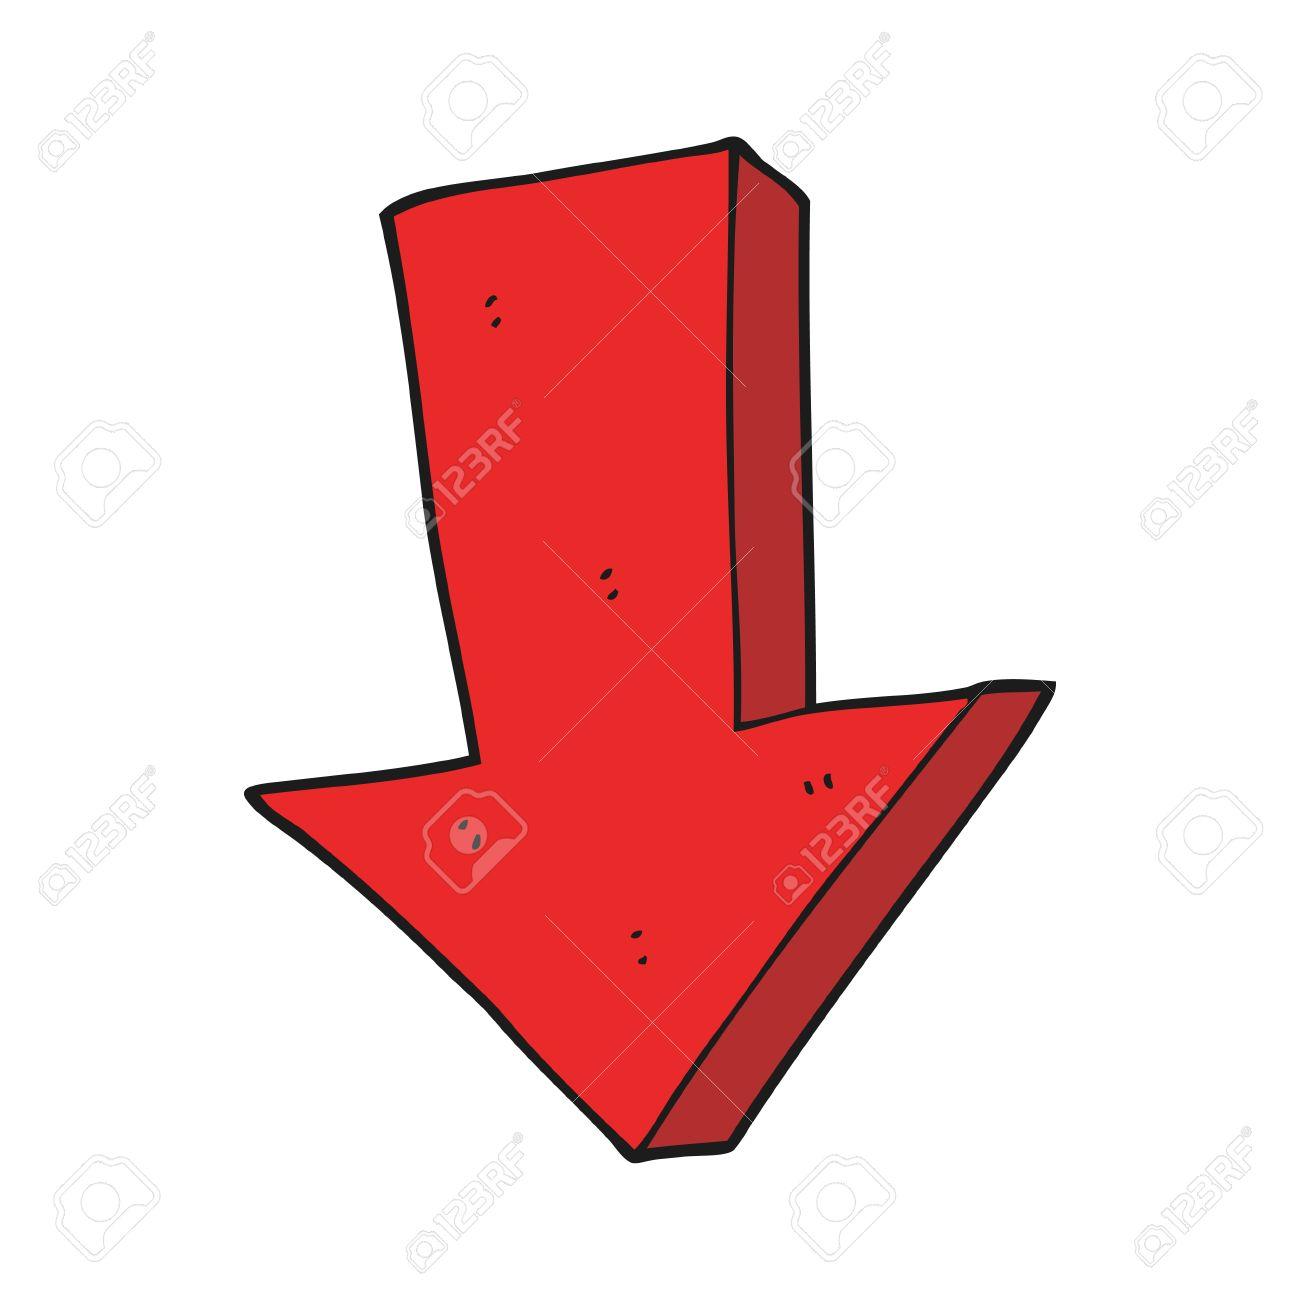 freehand drawn cartoon arrow pointing down.